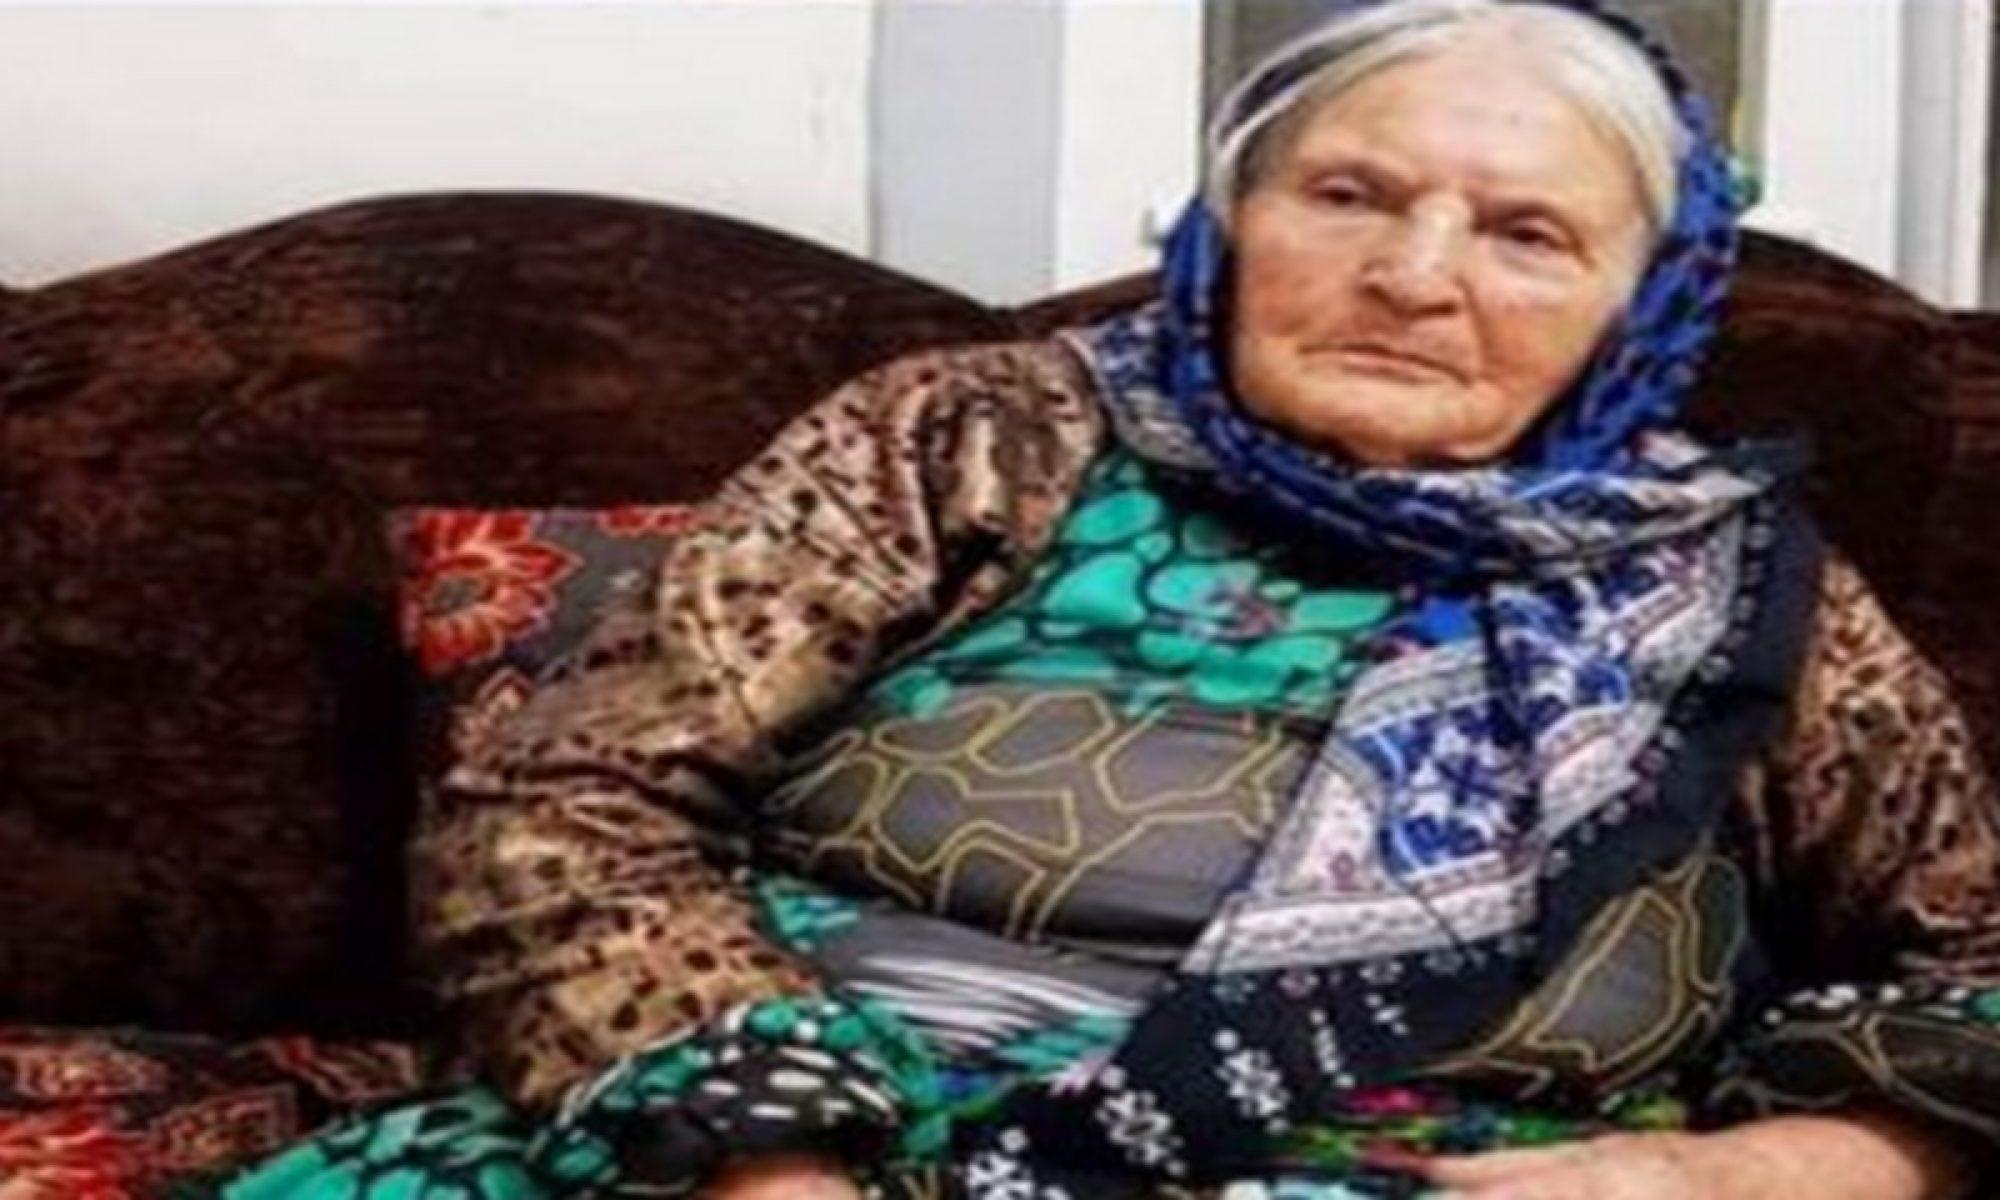 İlk Kürdistan bayrağını nakşeden Fatima Hüsêyni Mahabad'ta hayatını kaybetti